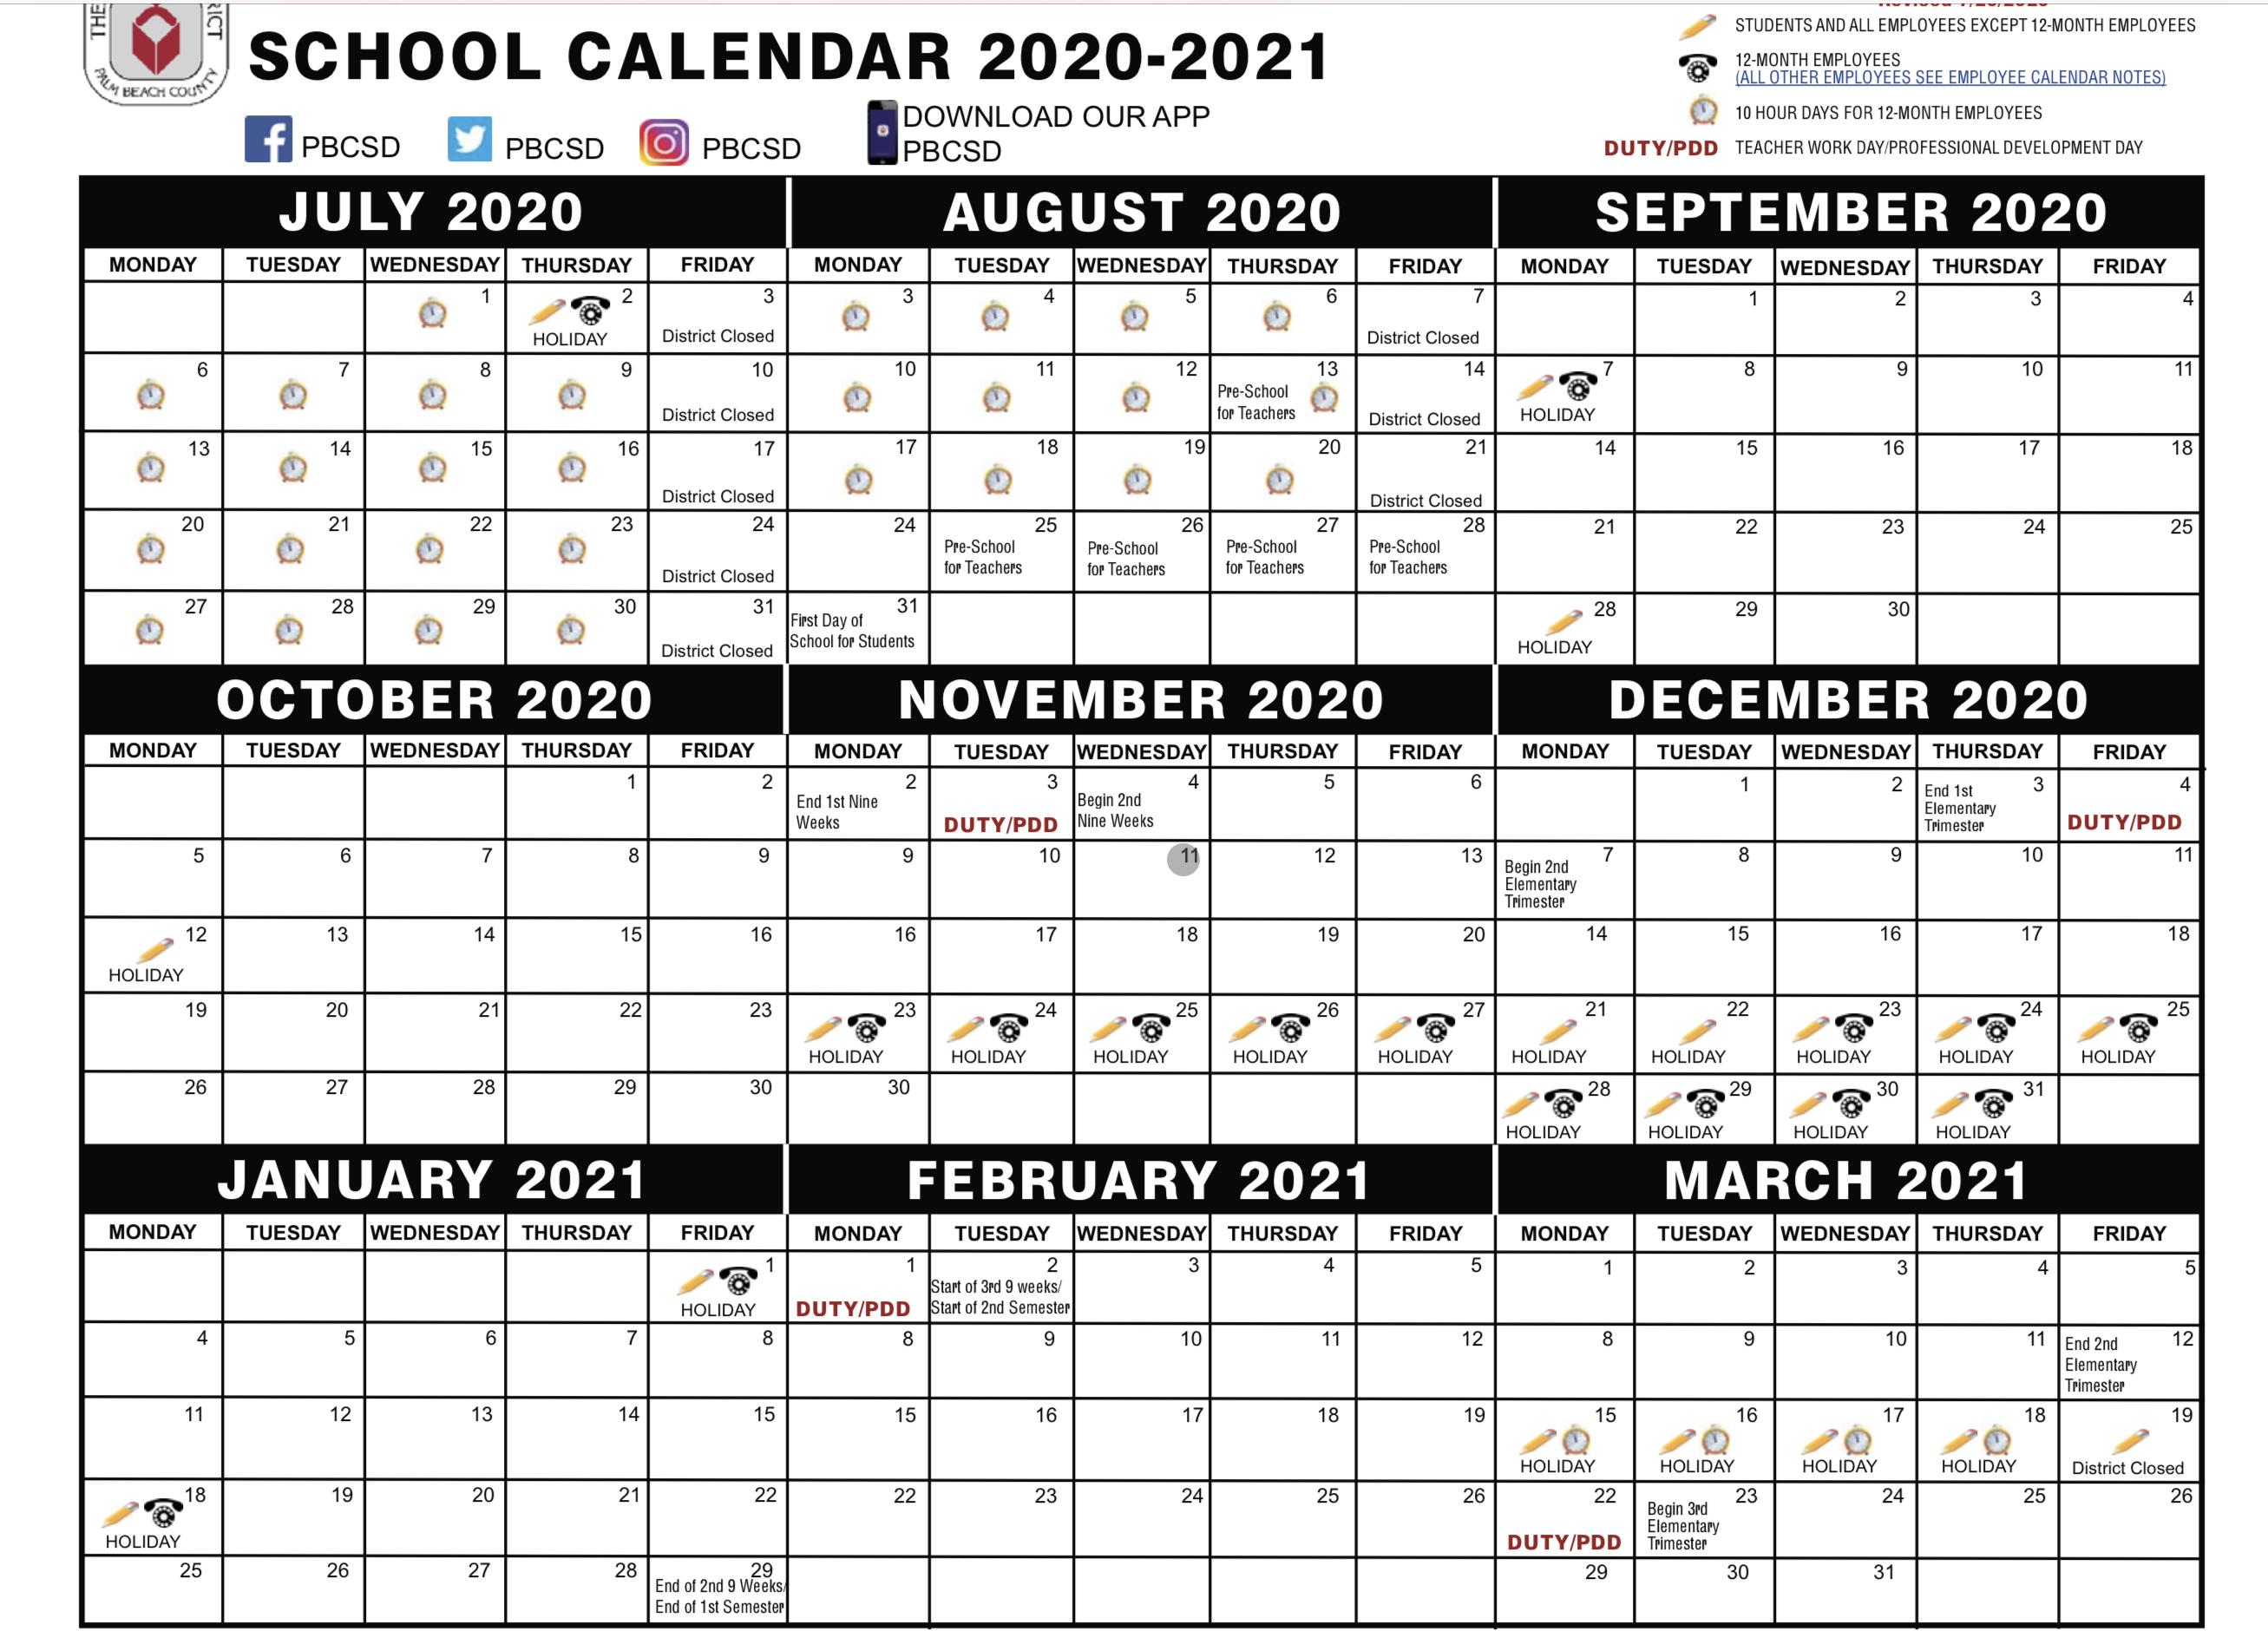 palm beach school calendar 2020-20201